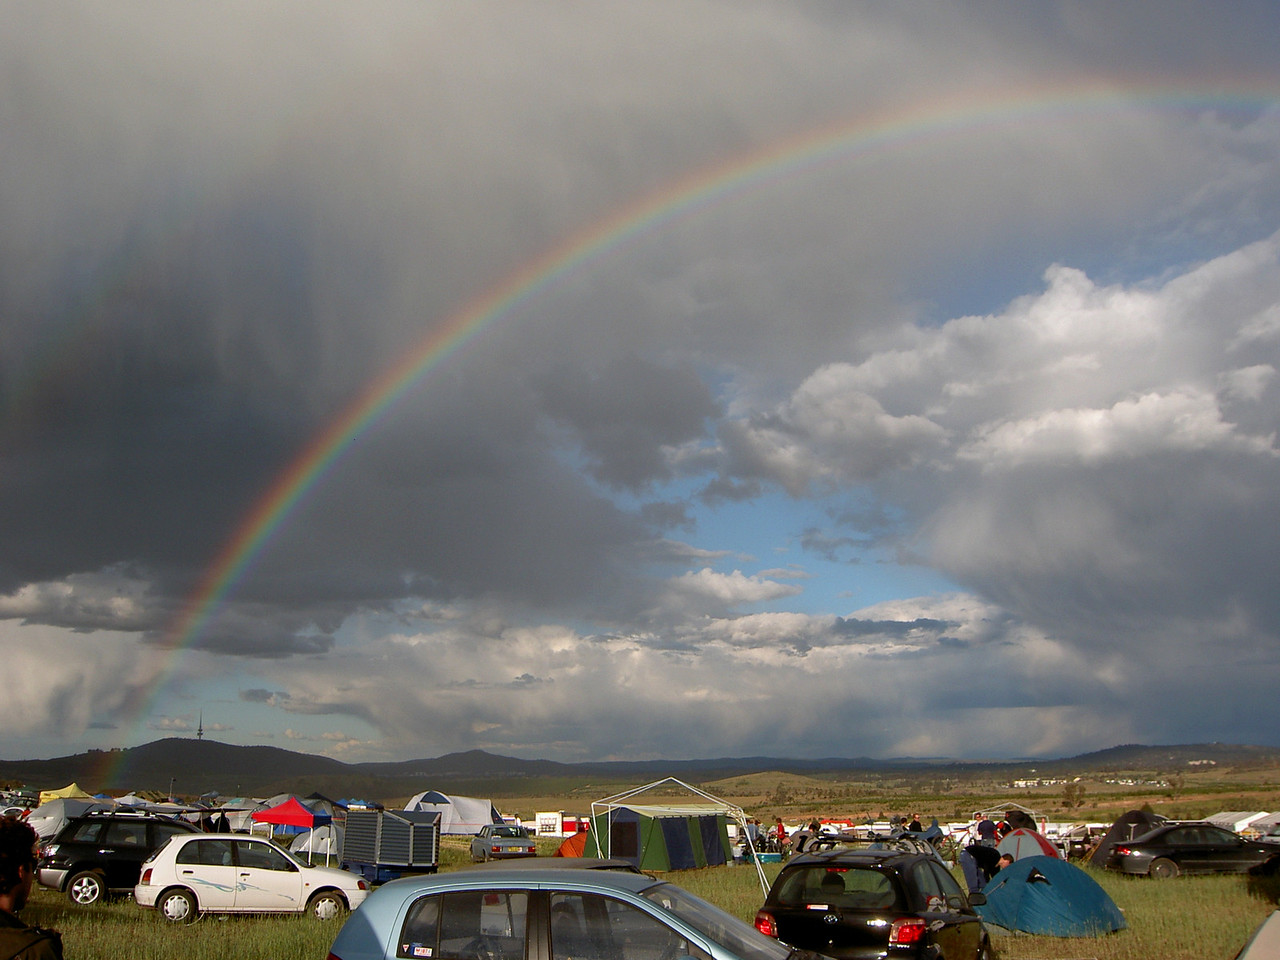 Rainbow over the site